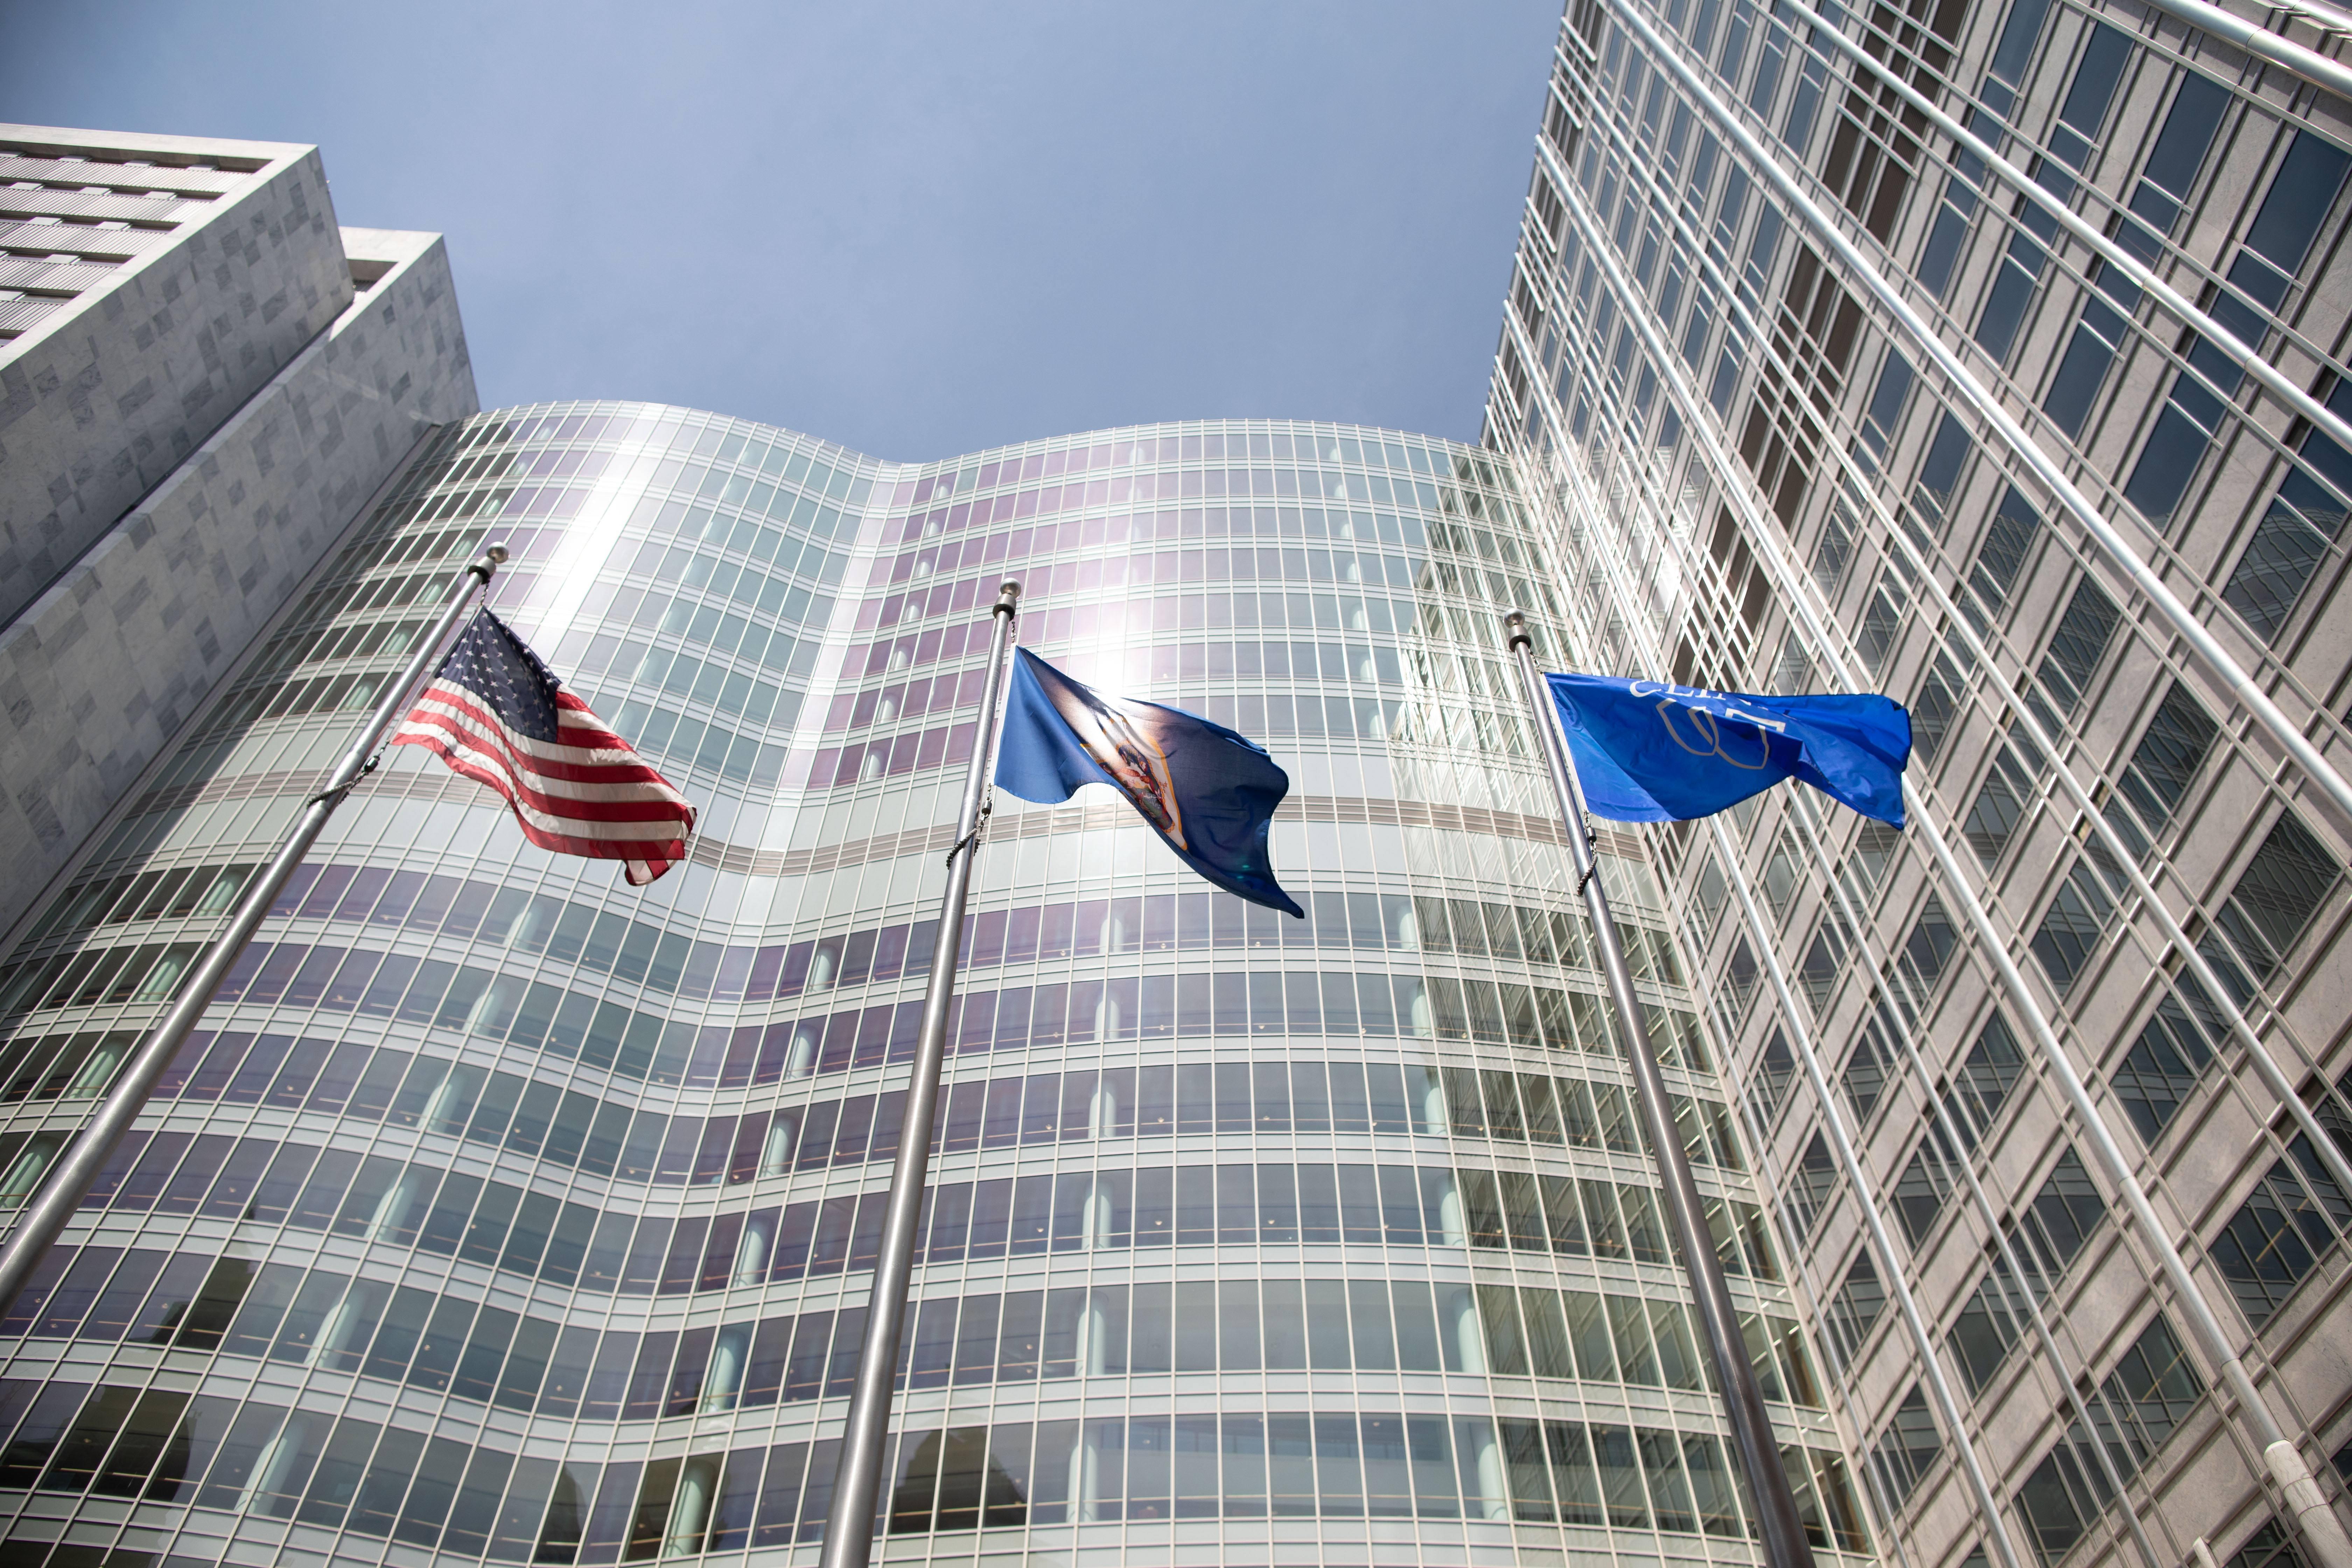 Mayo Clinic Gonda Building windows with the U.S. flag, the Mayo Clinic flag and the Minnesota State flag flying outside